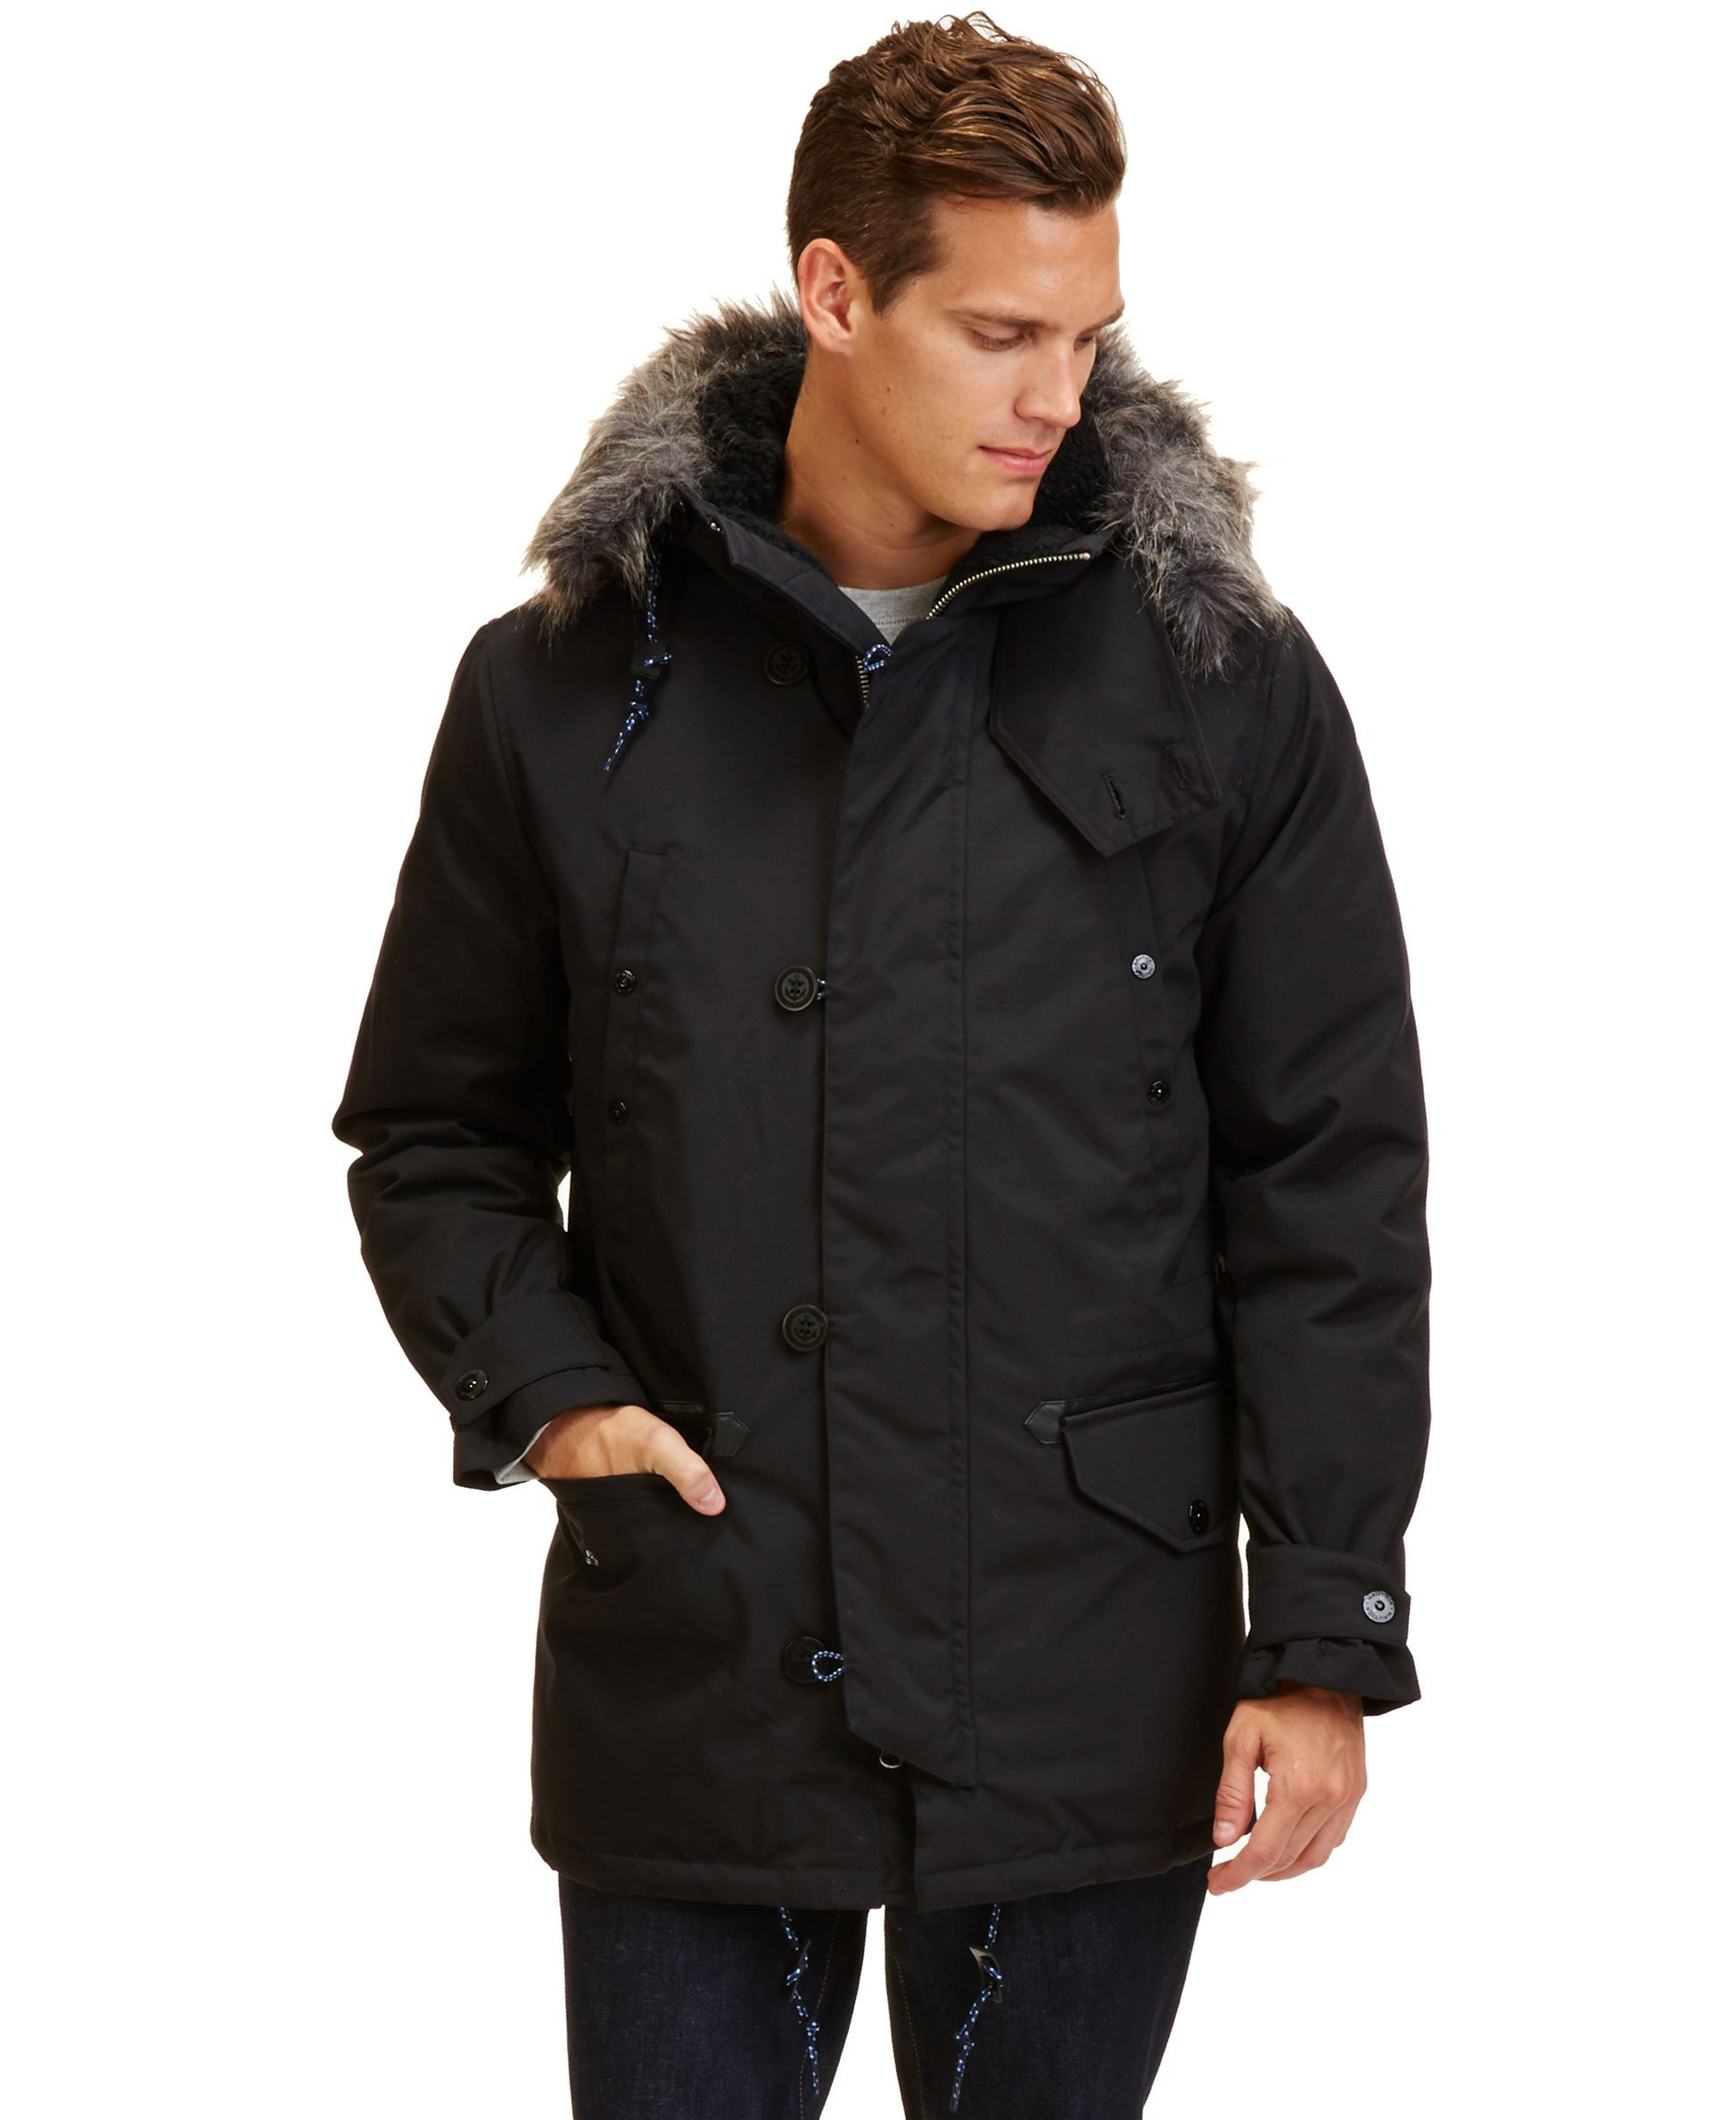 Nautica Parka With Removable Faux Fur Hood Coats Jackets Men Macy S Men S Coats And Jackets Faux Fur Hood Mens Jackets [ 2378 x 1947 Pixel ]